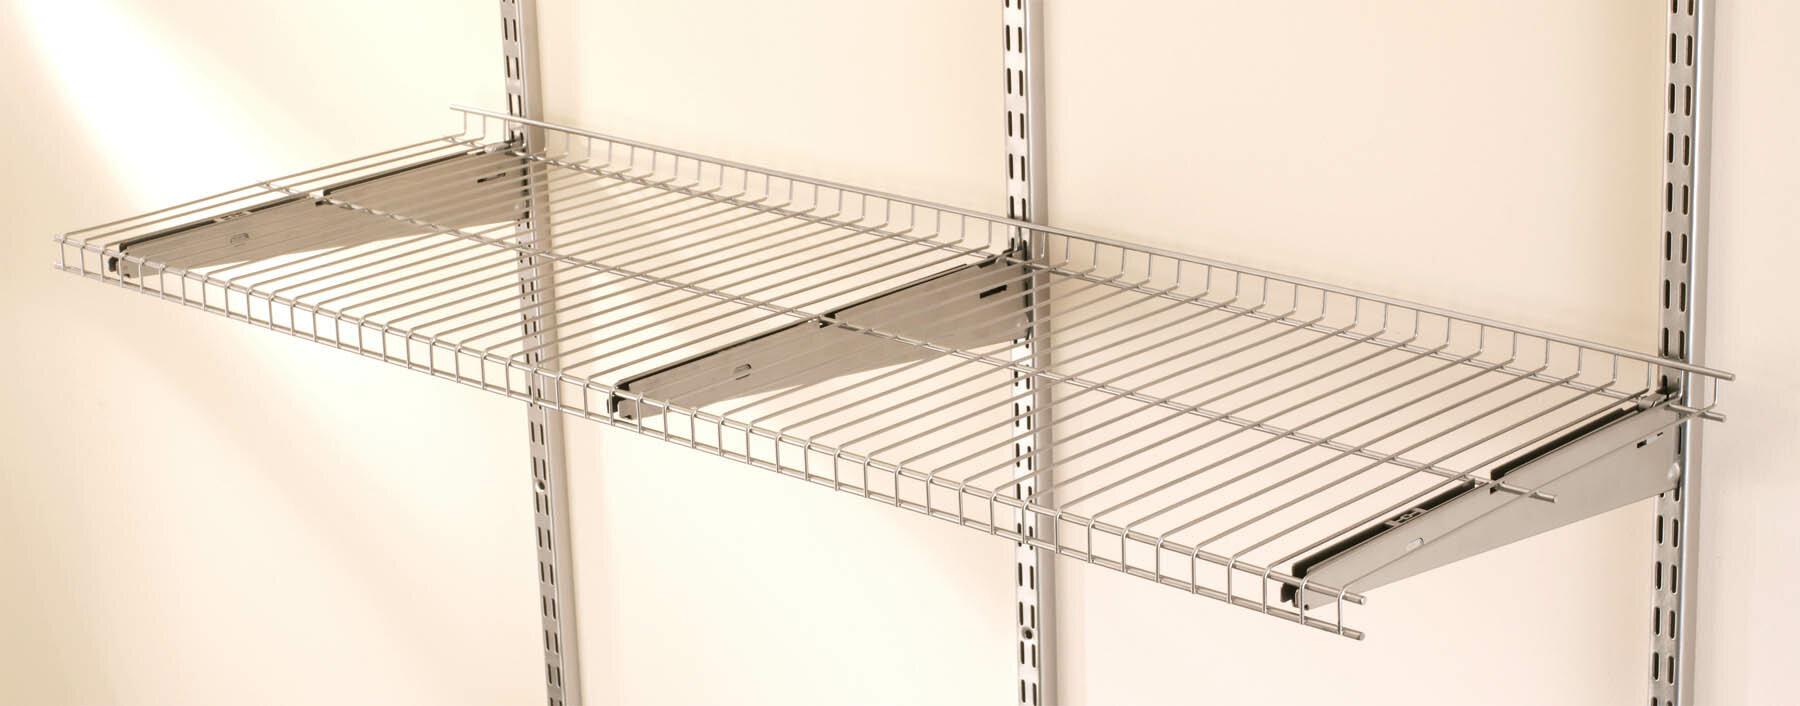 Rubbermaid Fasttrack Wire Shelf Reviews Wayfair